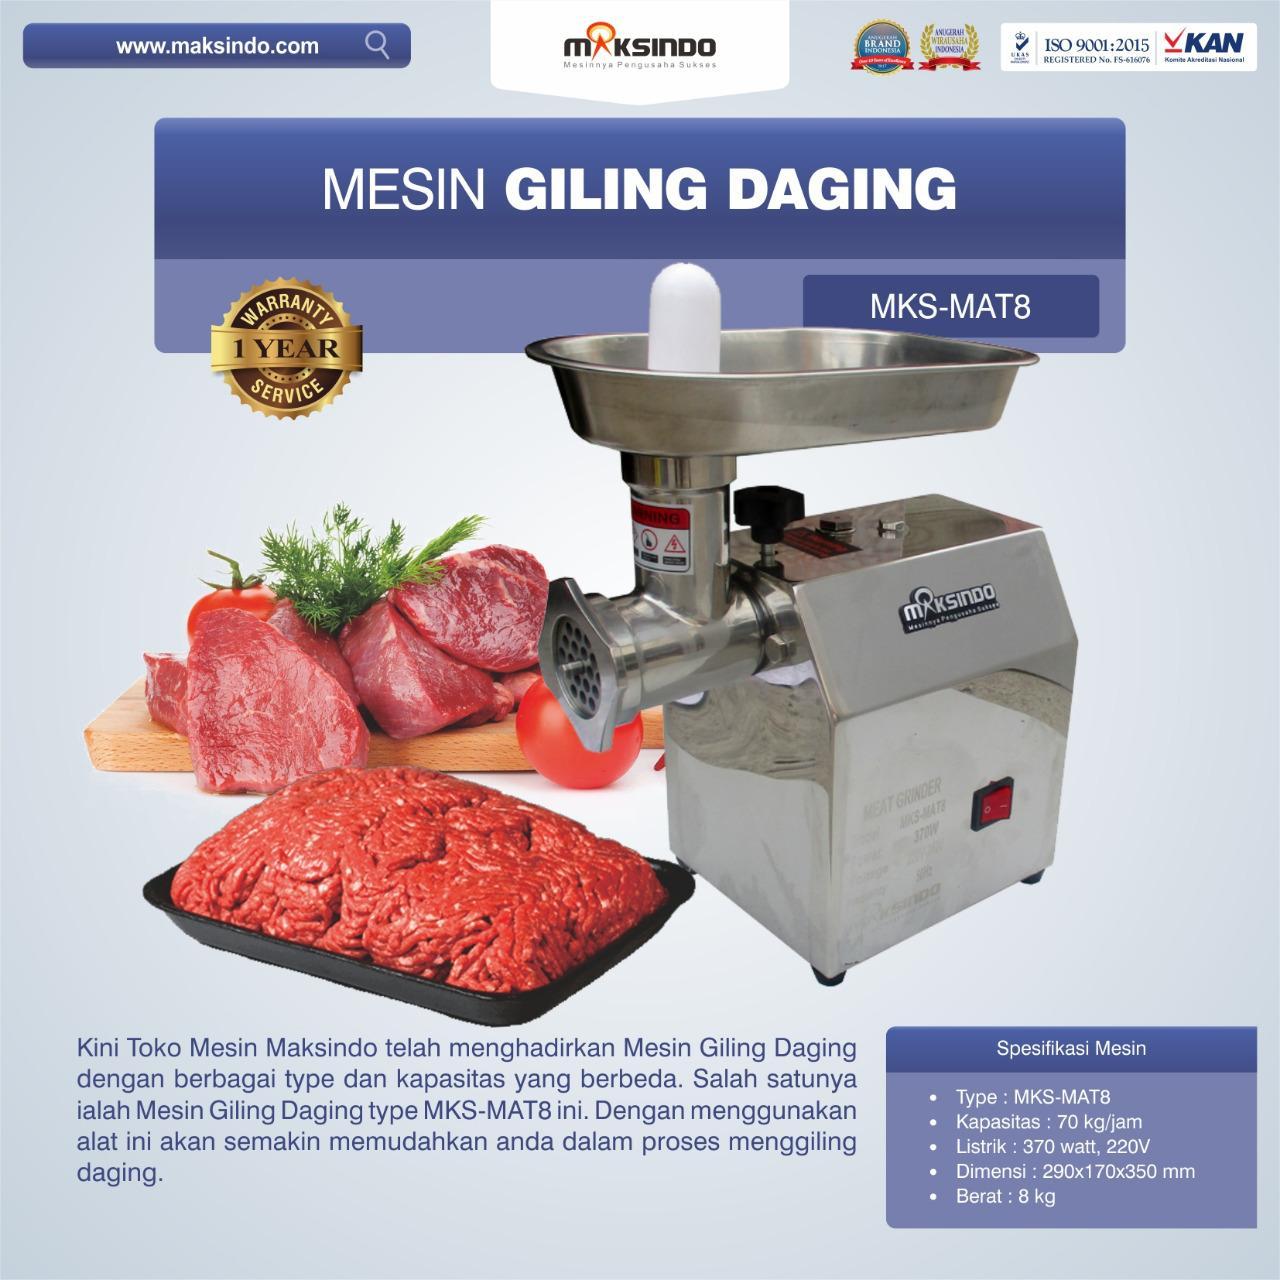 Jual Mesin Giling Daging MKS-MAT8 di Yogyakarta